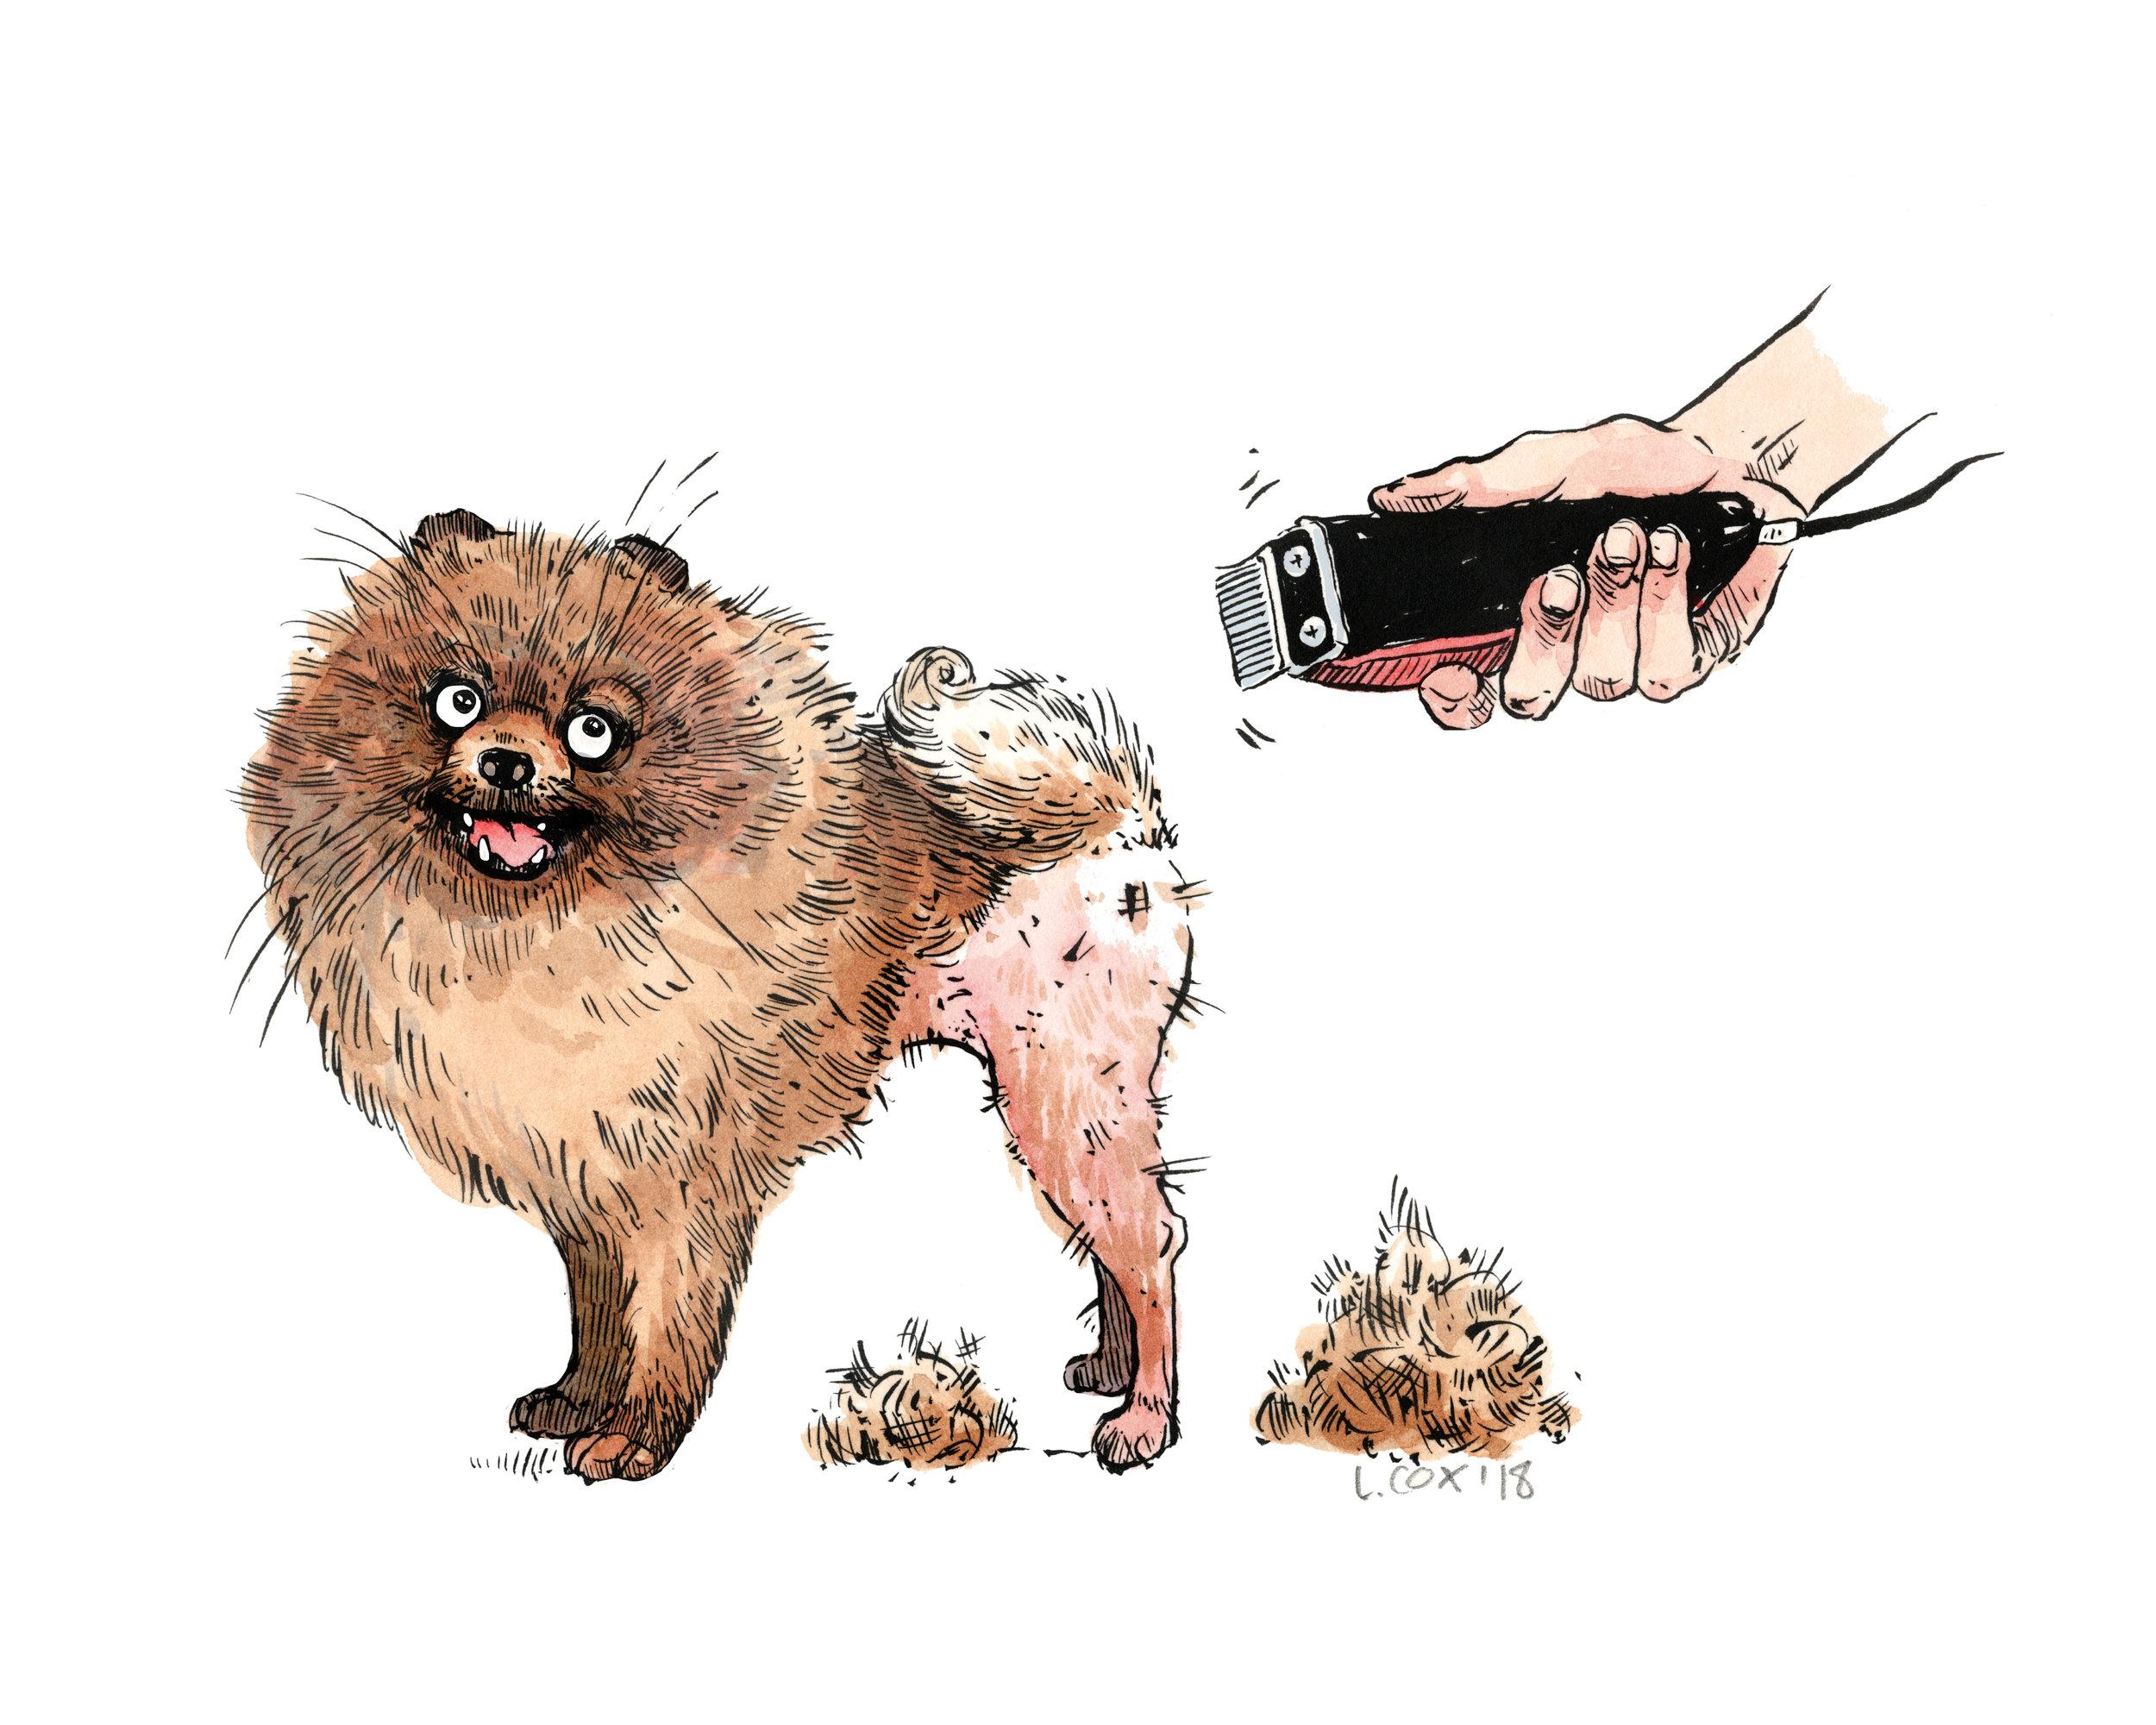 Pomeranian for Fur Fish & Game Magazine, Ink & Watercolor 2018